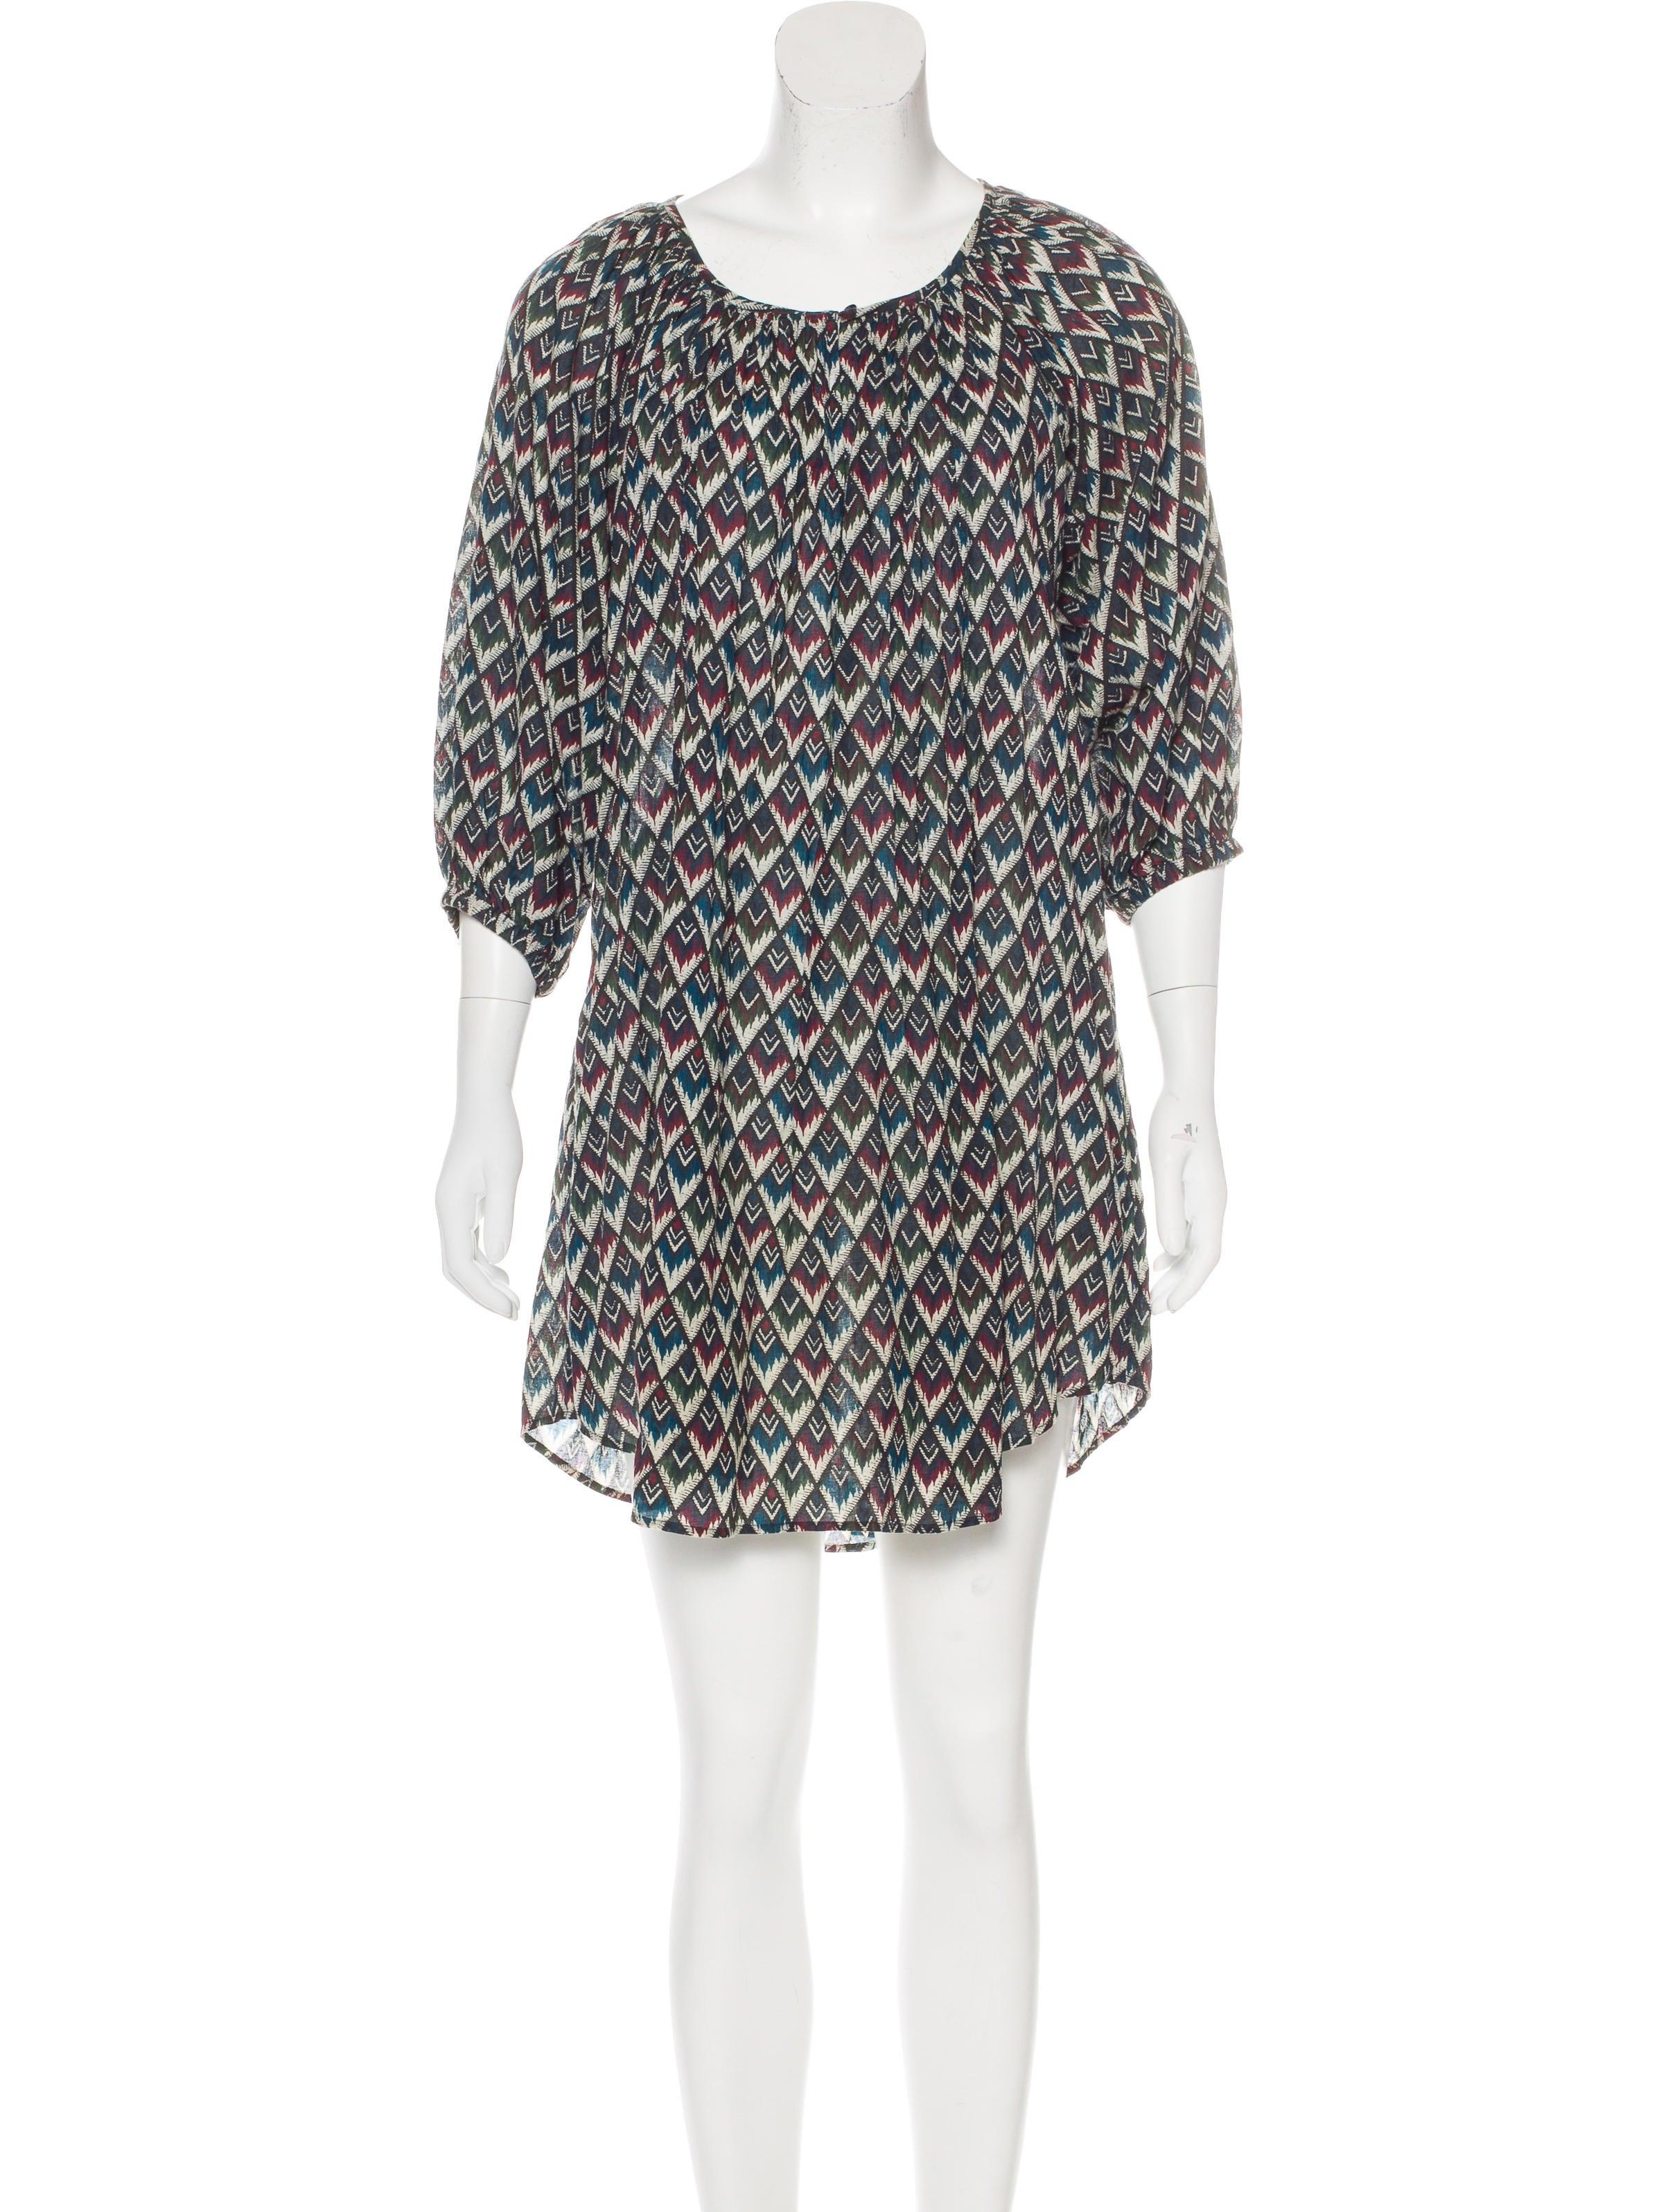 Toile isabel marant long sleeve printed dress clothing for Isabel marant shirt dress